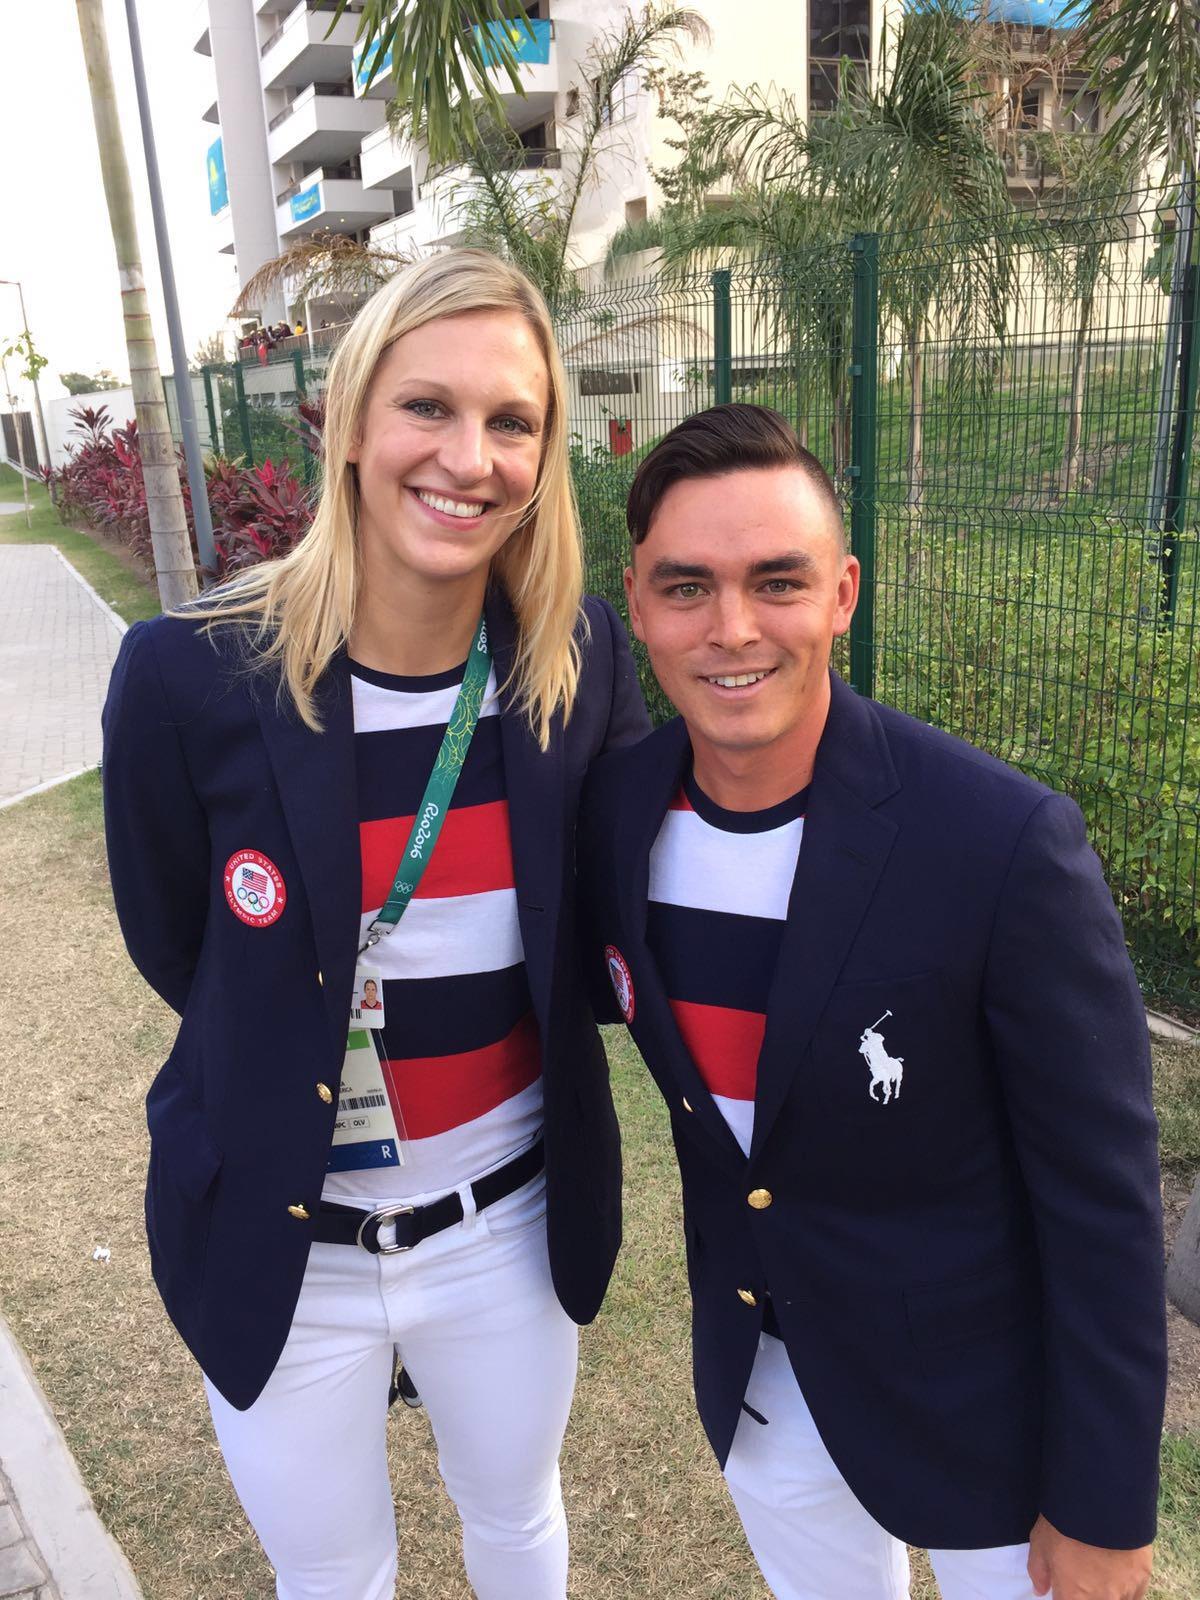 Christa Harmotto Dietzen and Rickie Fowler